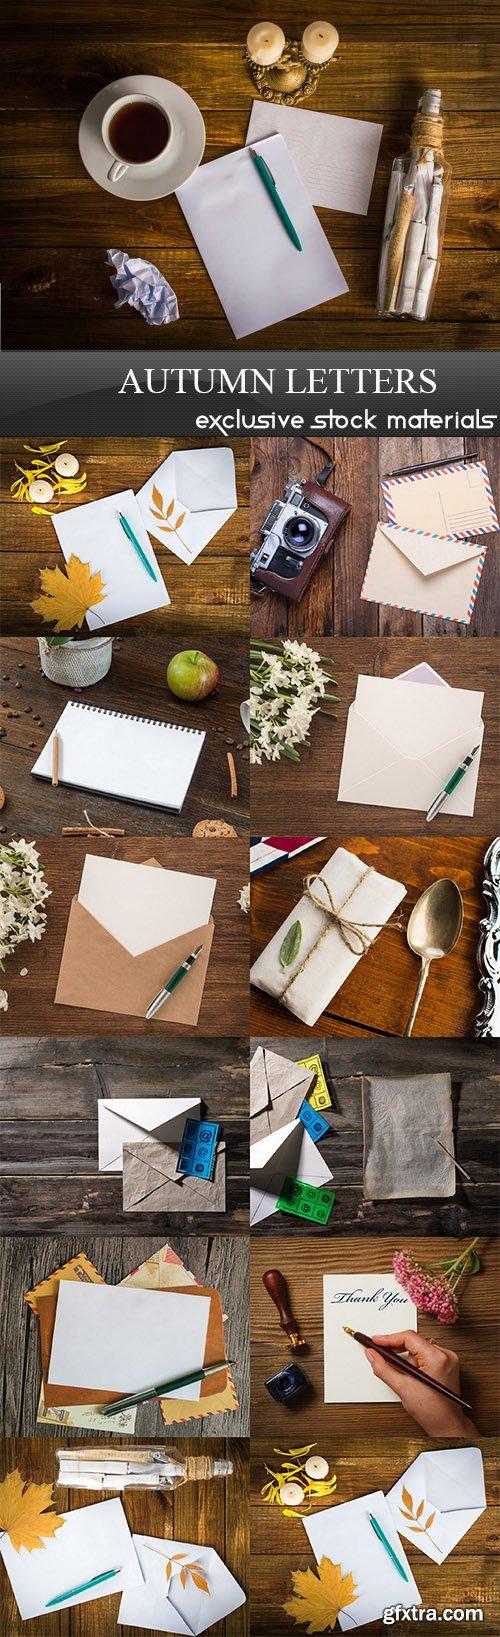 Autumn letters - 13 UHQ JPEG